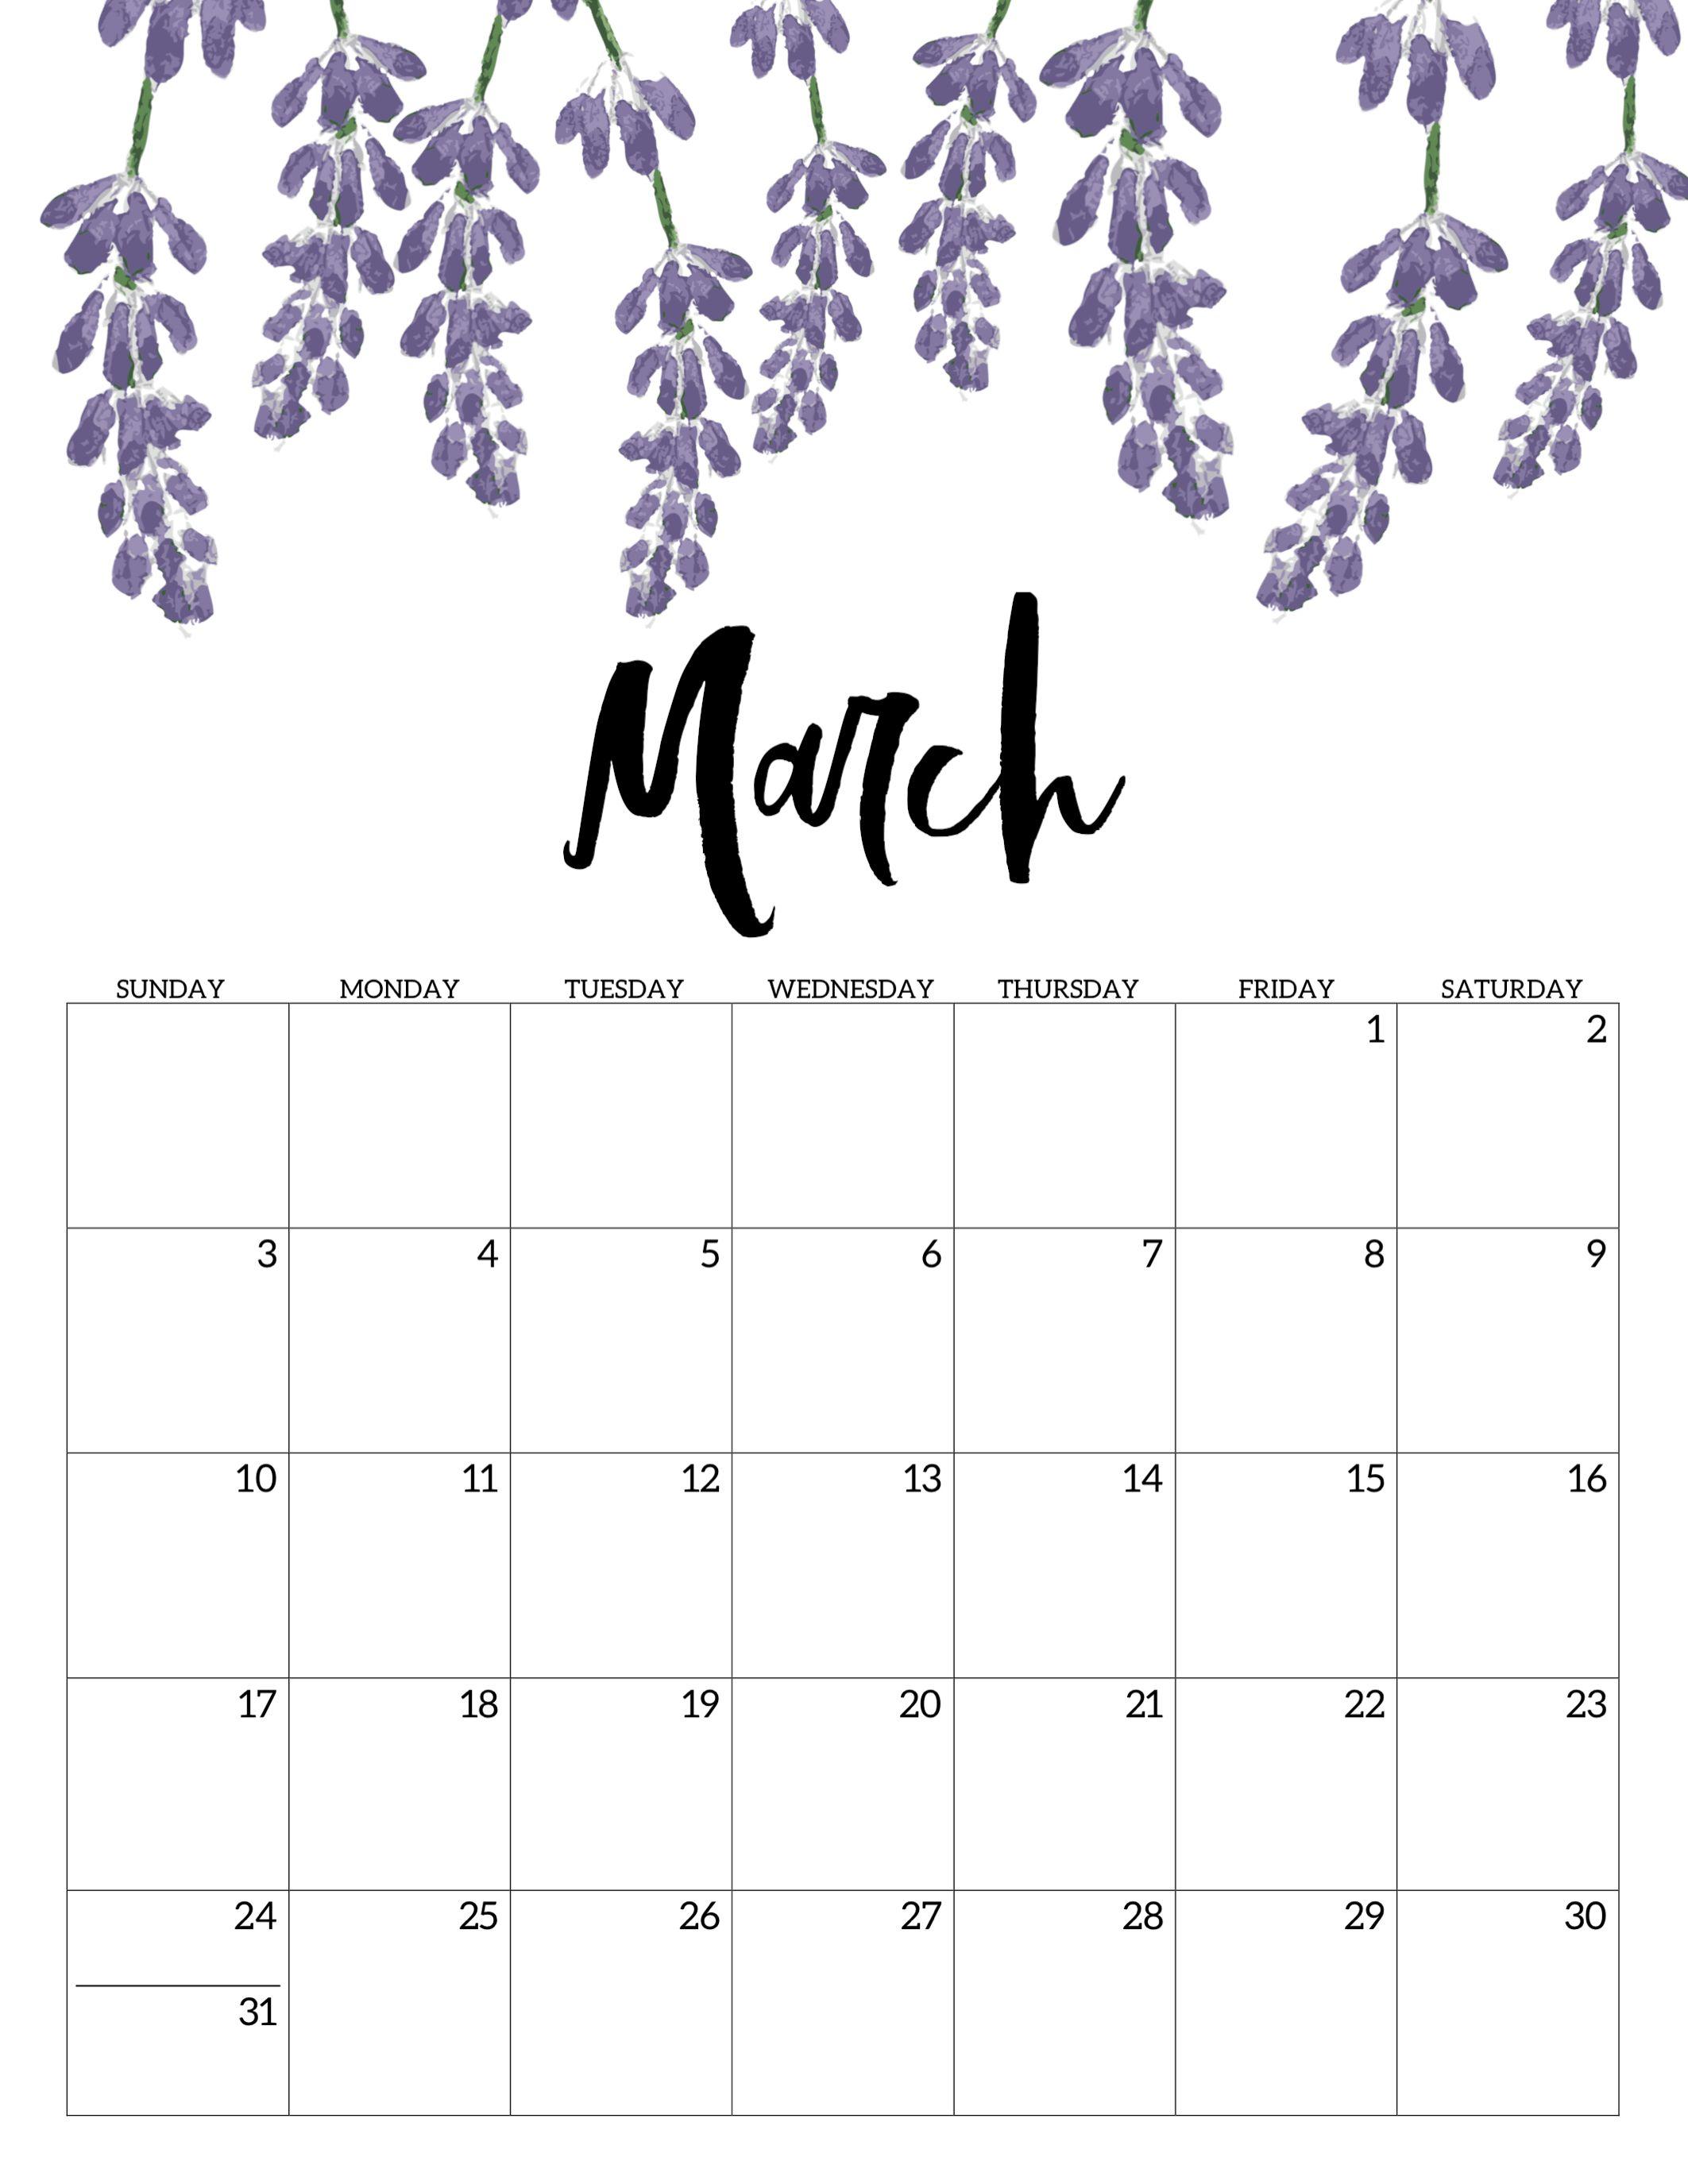 March 2019 Floral Desk Calendar March March2019